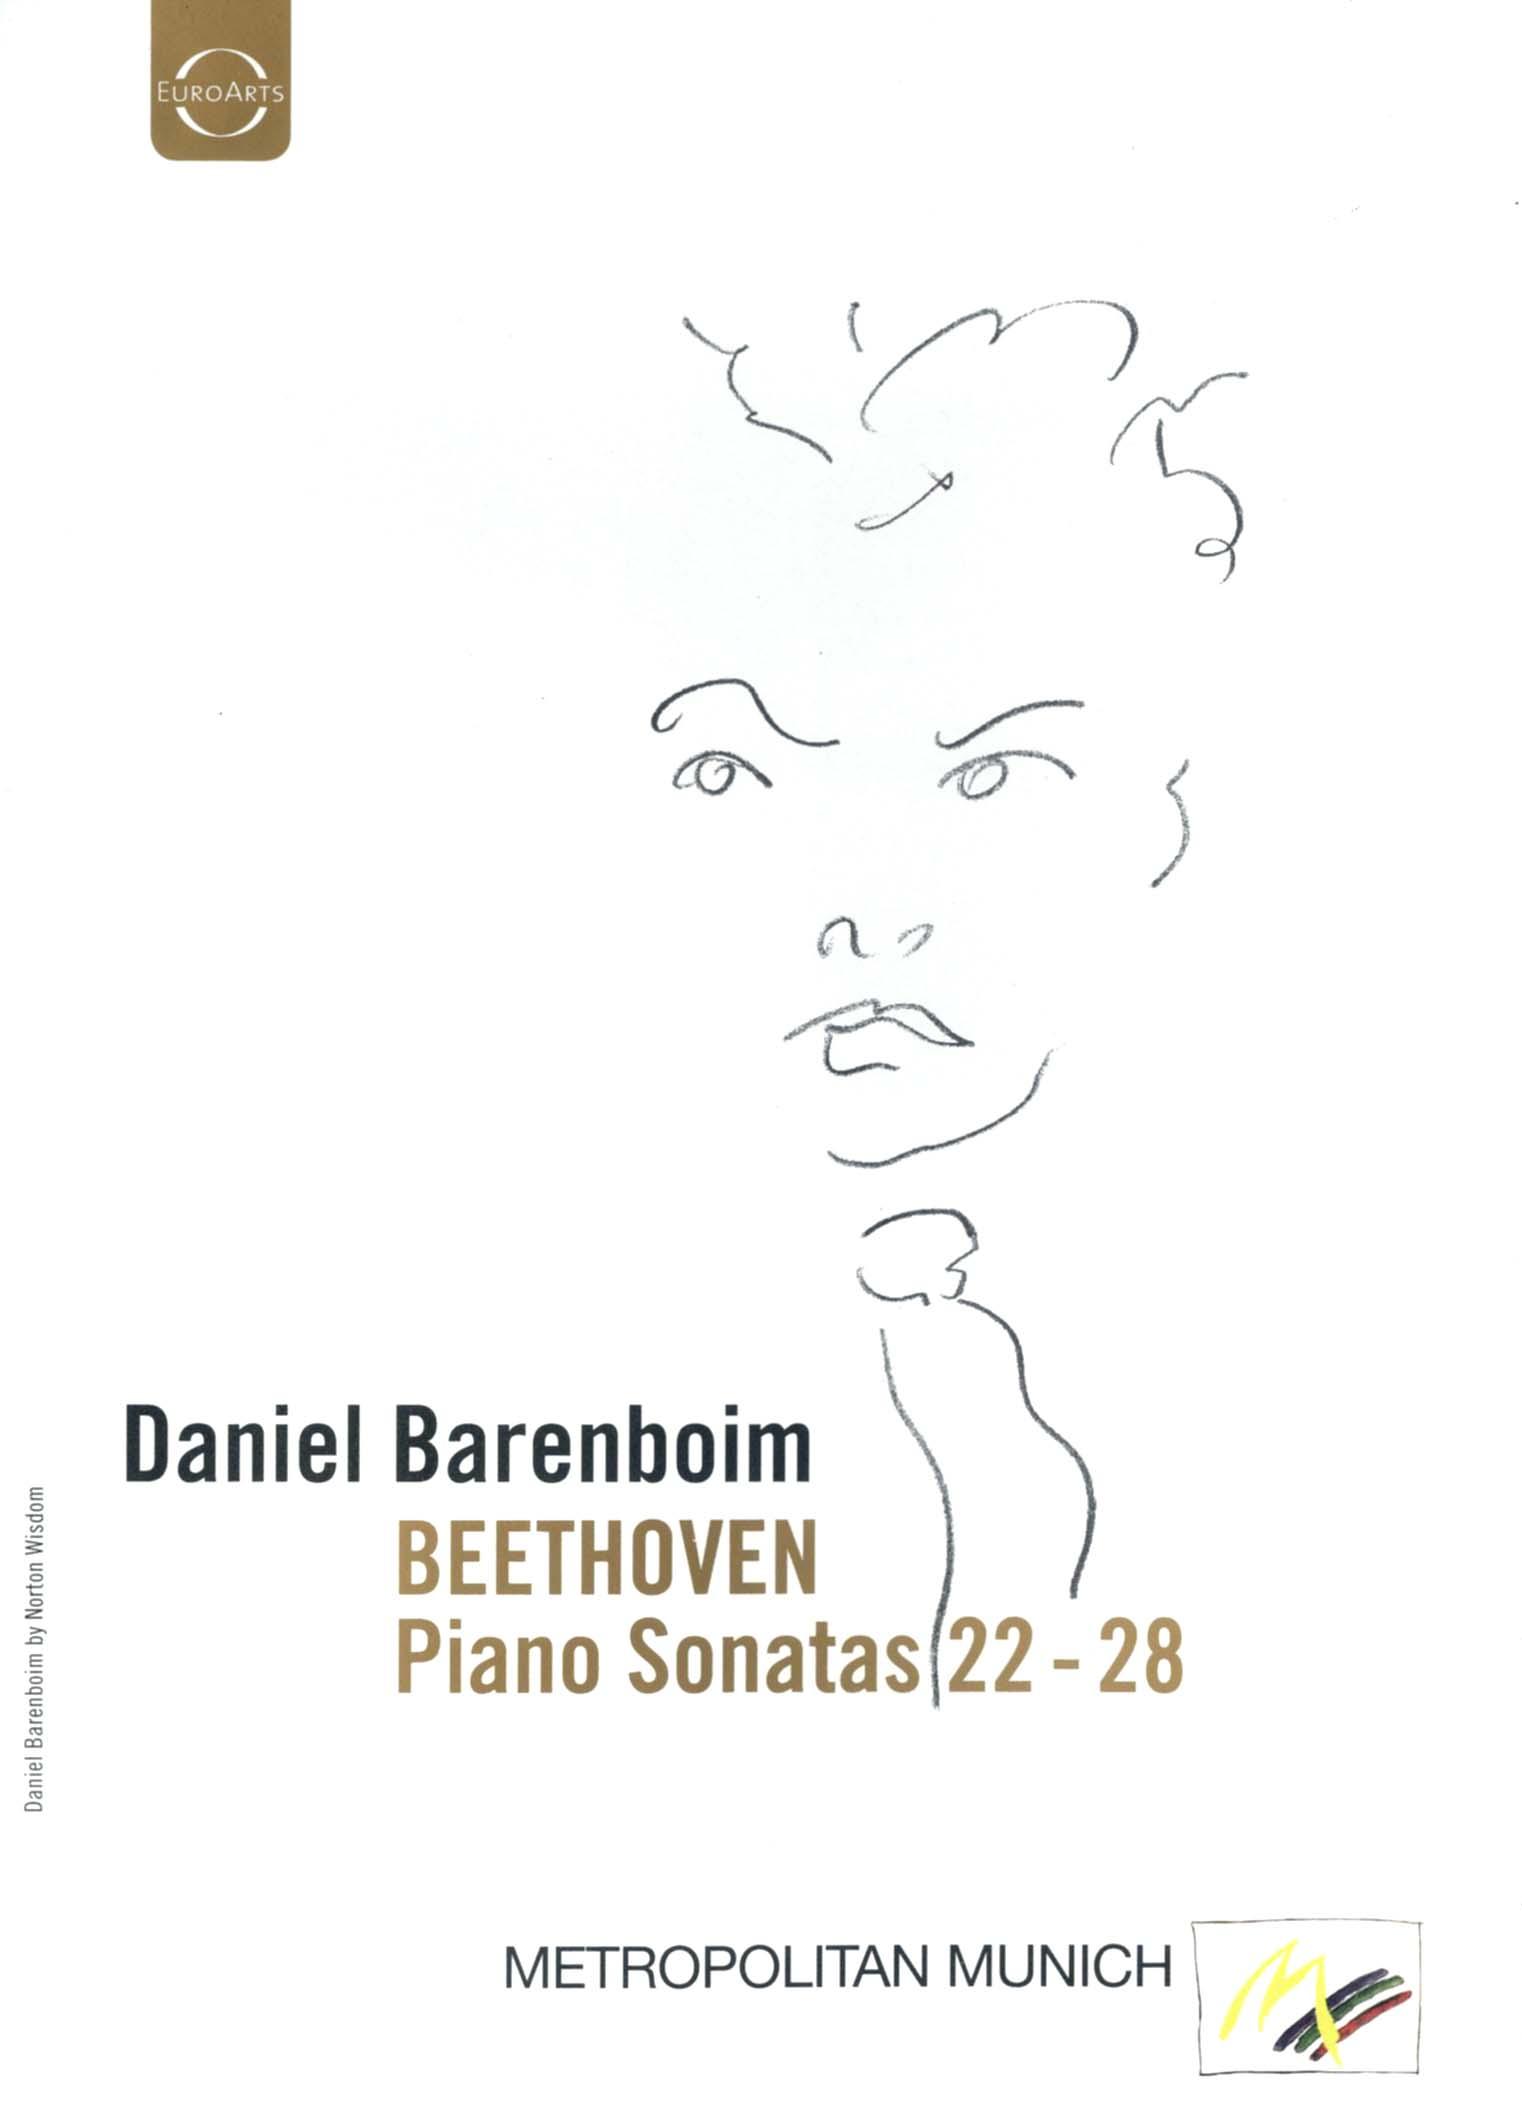 Daniel Barenboim: Beethoven - Piano Sonatas 22-28